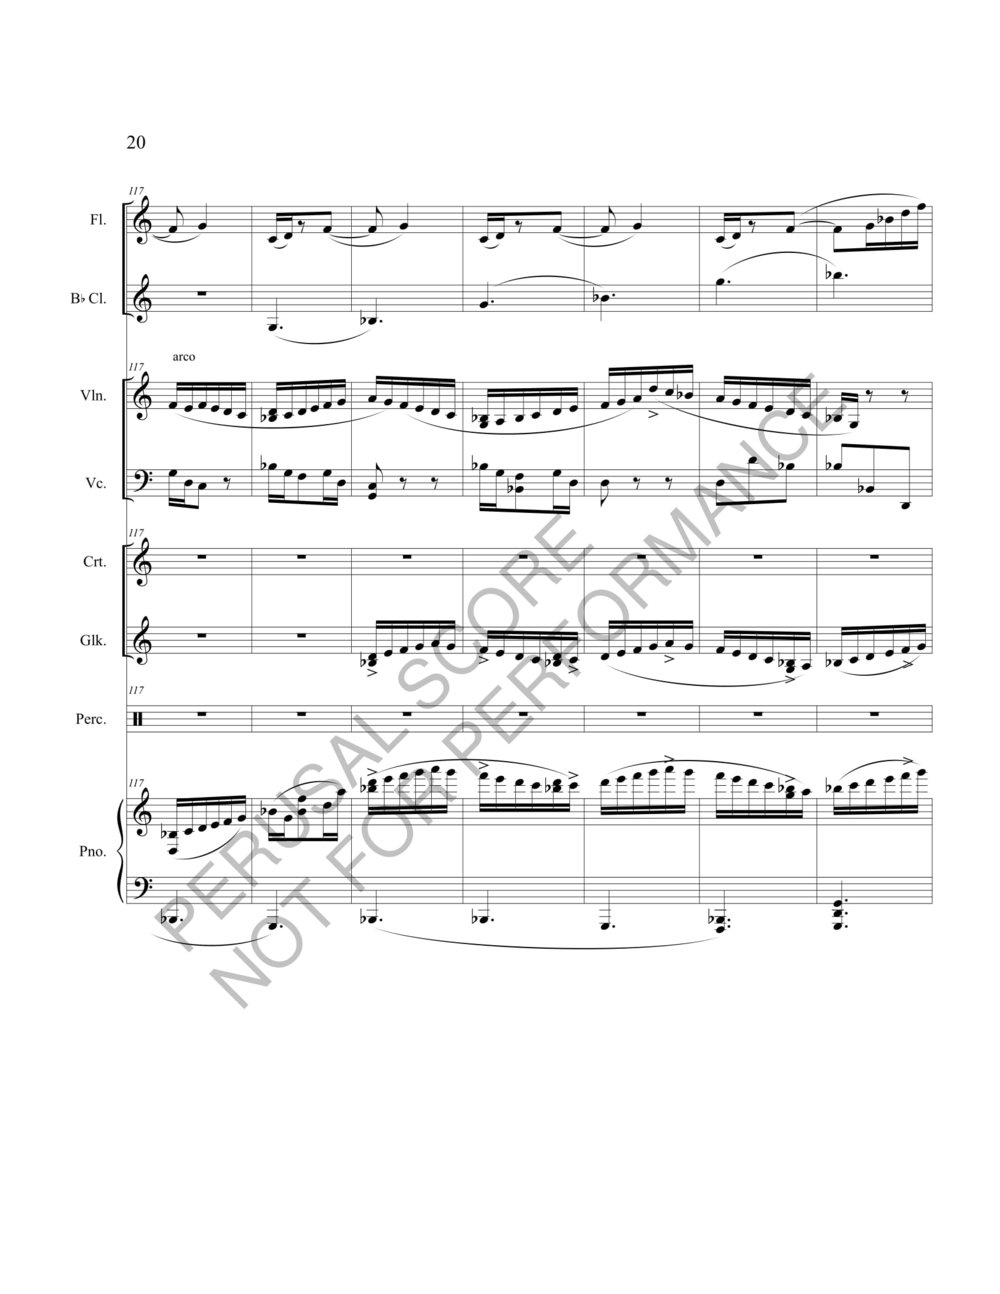 Boyd Terra Liberi Score-watermark-26.jpg